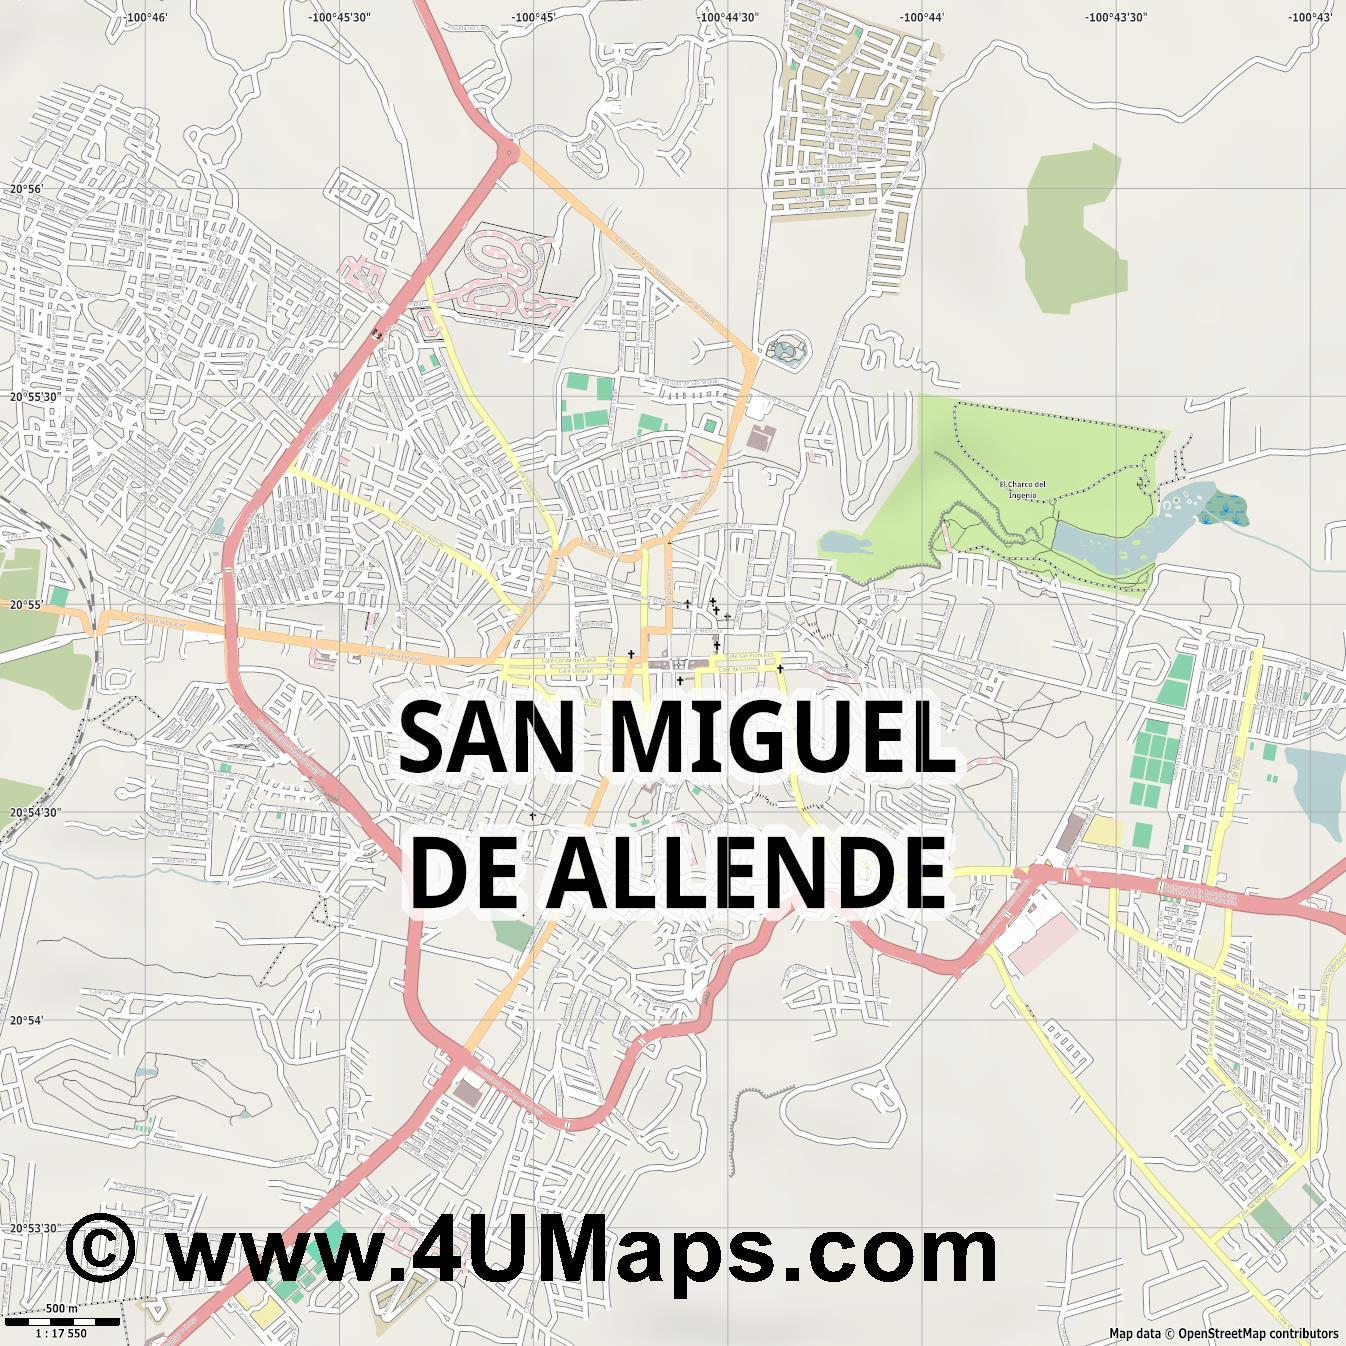 PDF, Svg Scalable Vector City Map San Miguel de Allende San Miguel De Allende Map on rio de janeiro map, rincon de guayabitos map, ixtapan de la sal map, queretaro map, real de catorce map, puerto vallarta map, ixtapa zihuatanejo map, hermosillo map, segovia spain on a map, mexico map, puebla on map, latin america map, chichen itza map, morelia map, cozumel map, san miguel county nm map, antigua guatemala map, buenos aires map, isla mujeres map, san cristobal de las casas map,